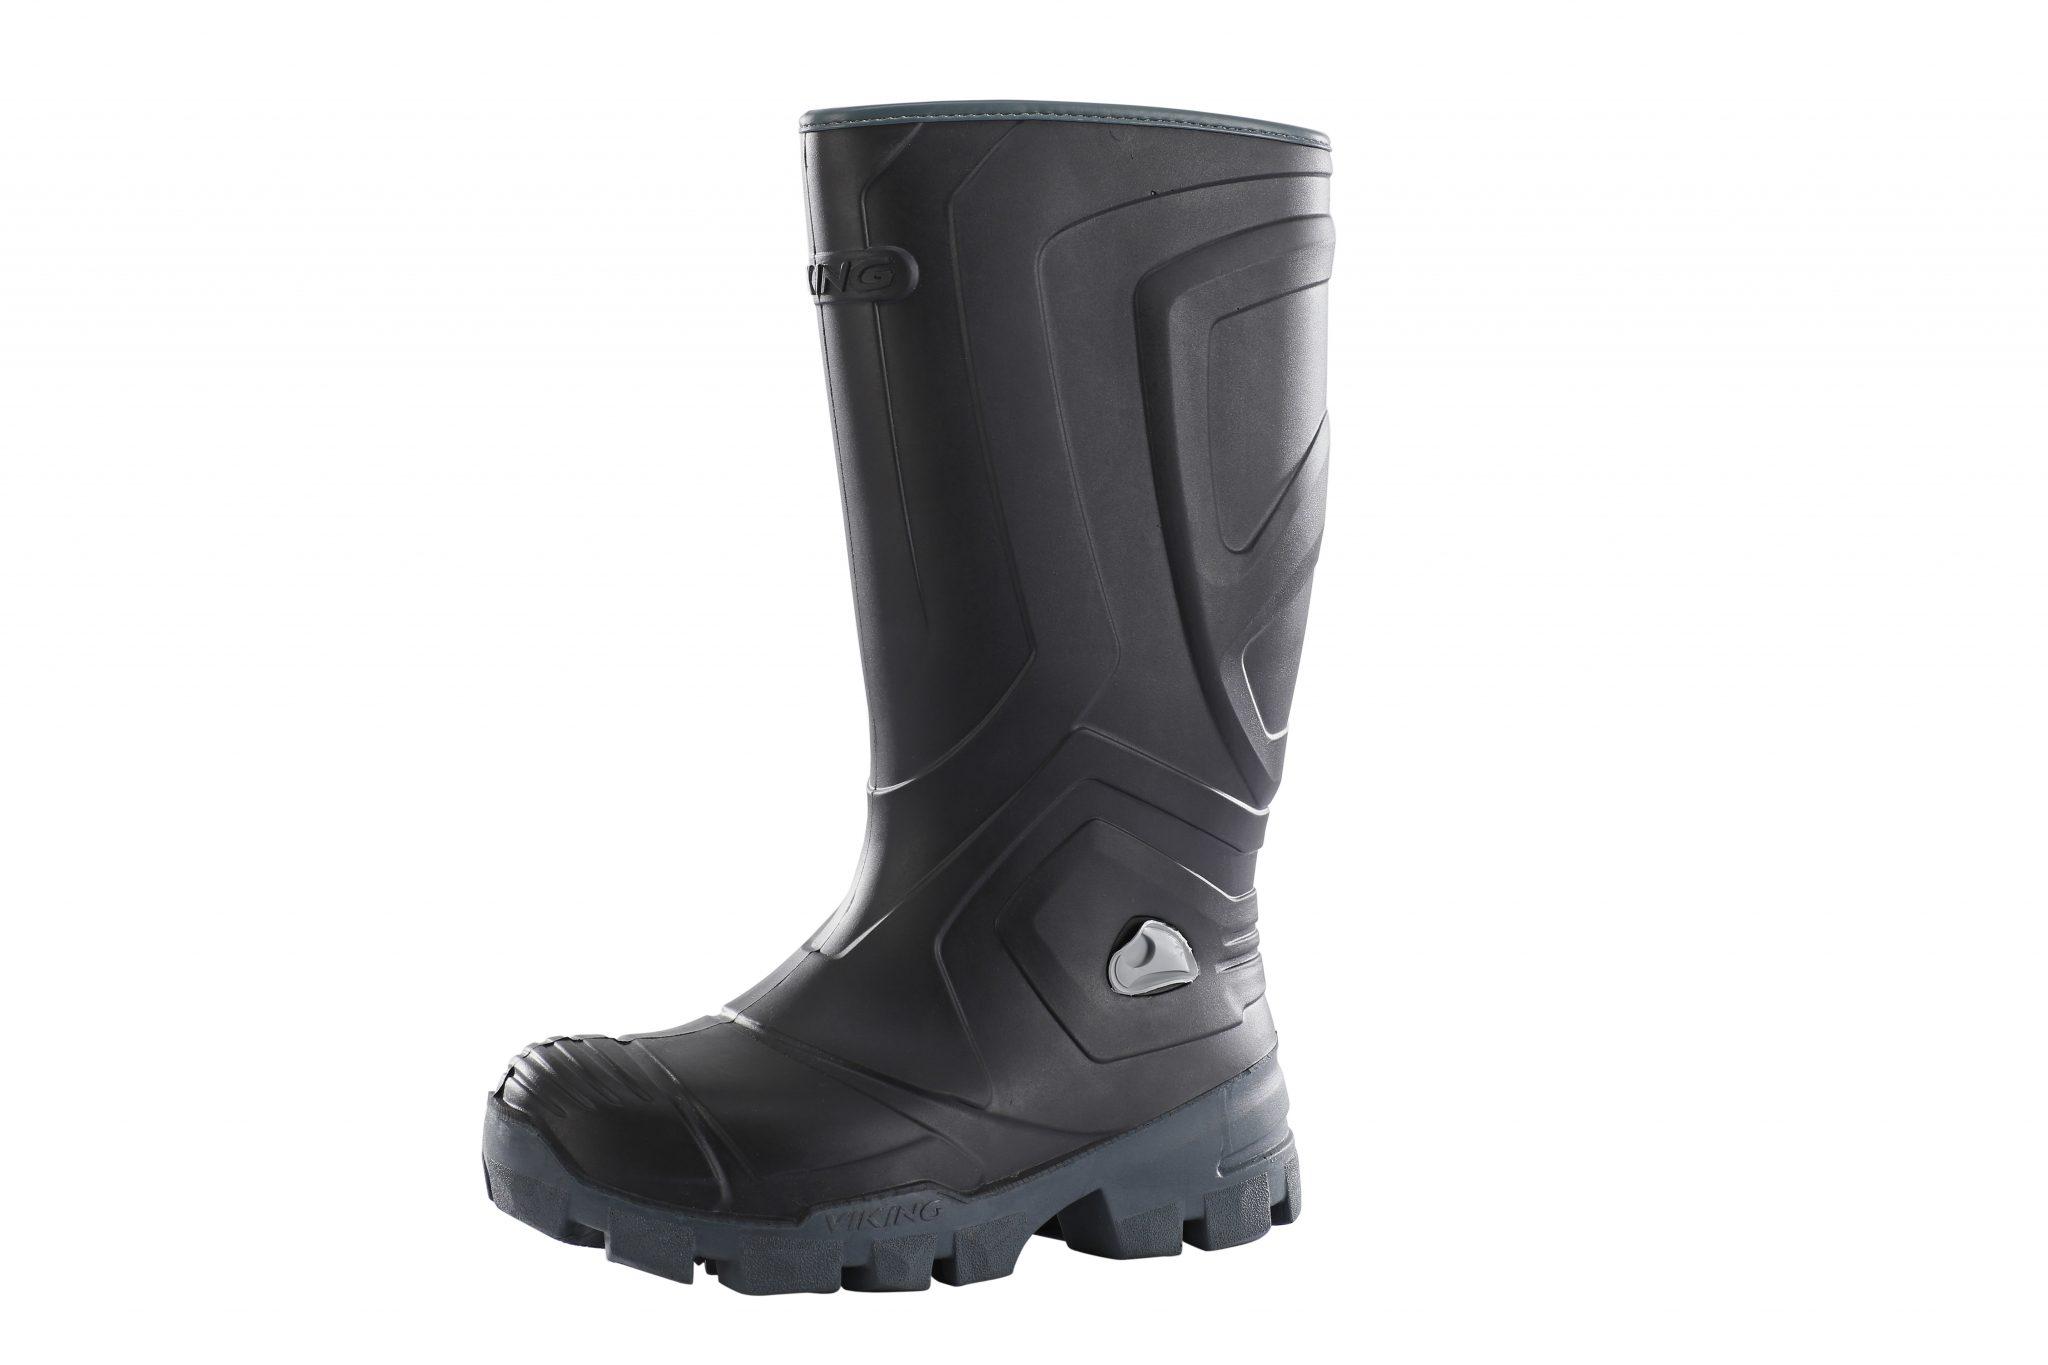 VIKING Trekkingschuh »Viking Icefighter Boots Unisex«